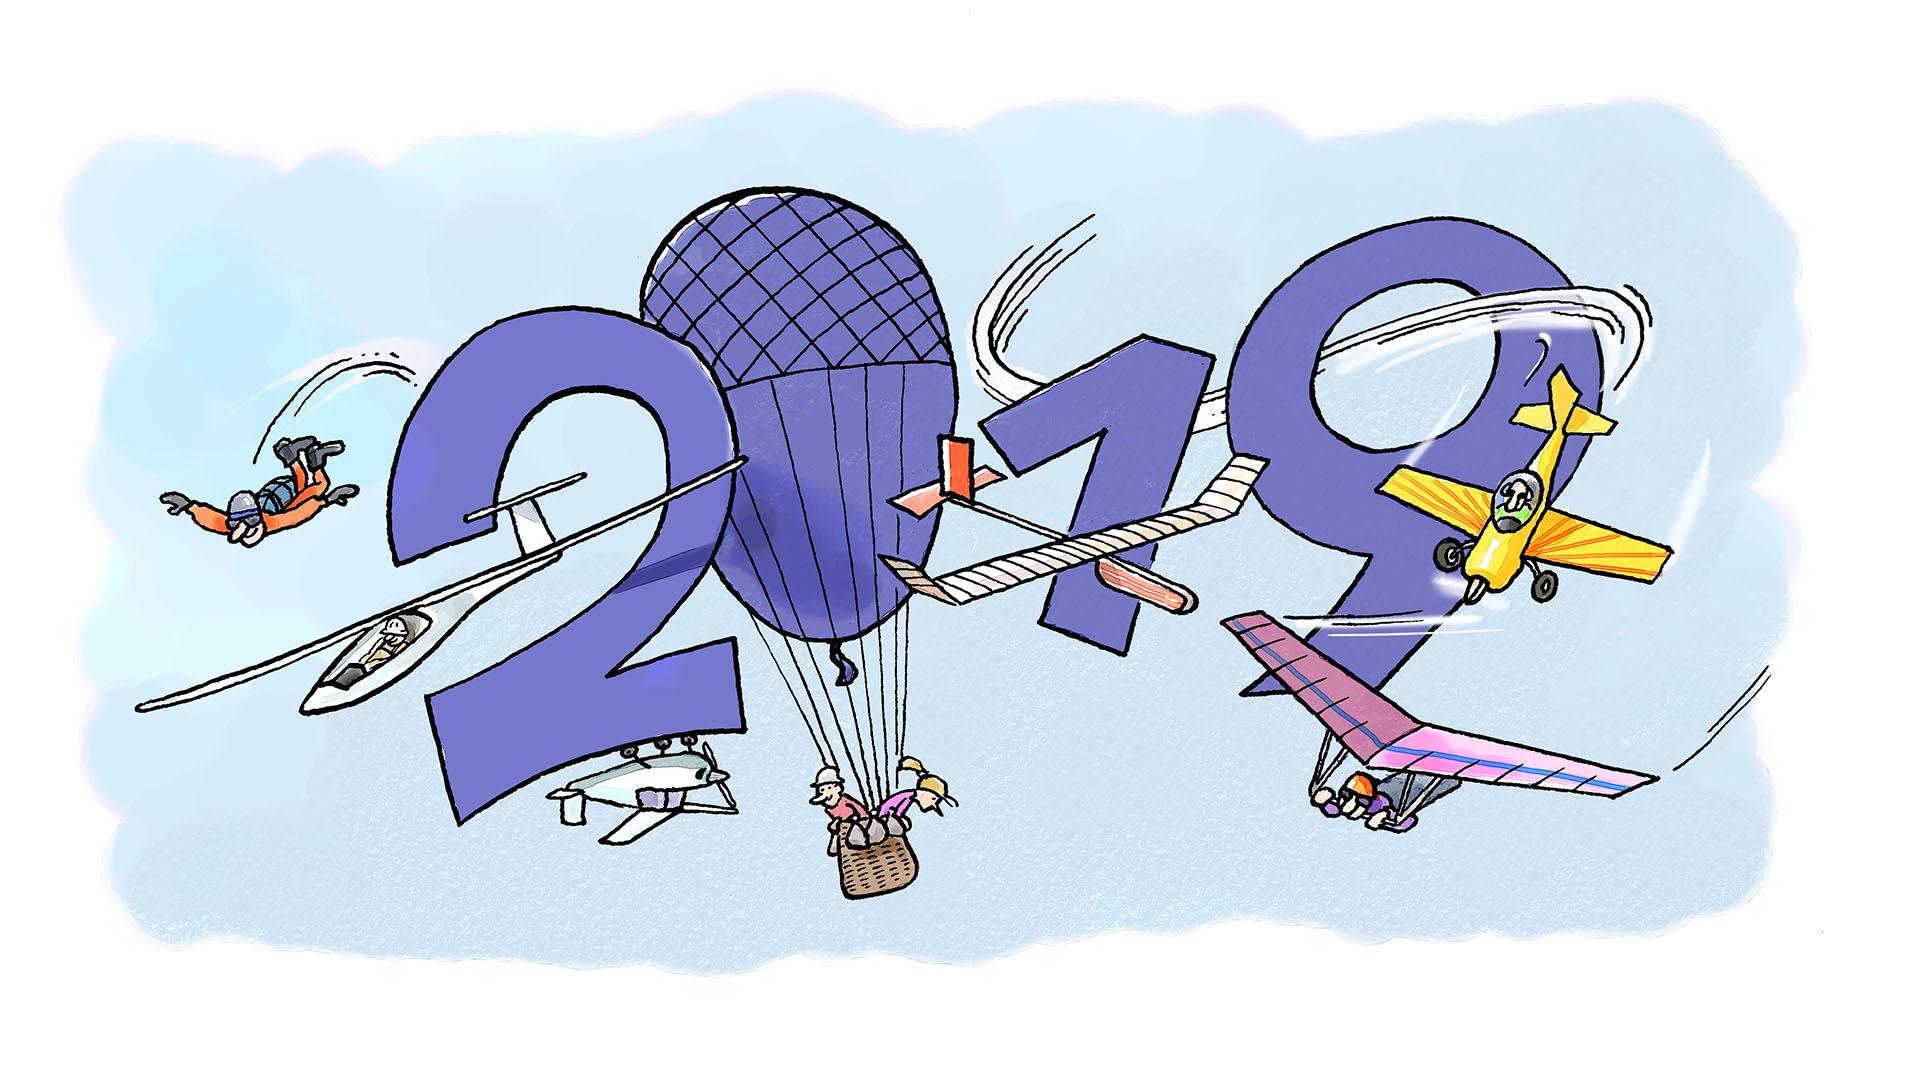 Grafik von Olaf Schumacher (www.cartoonhouse.de)